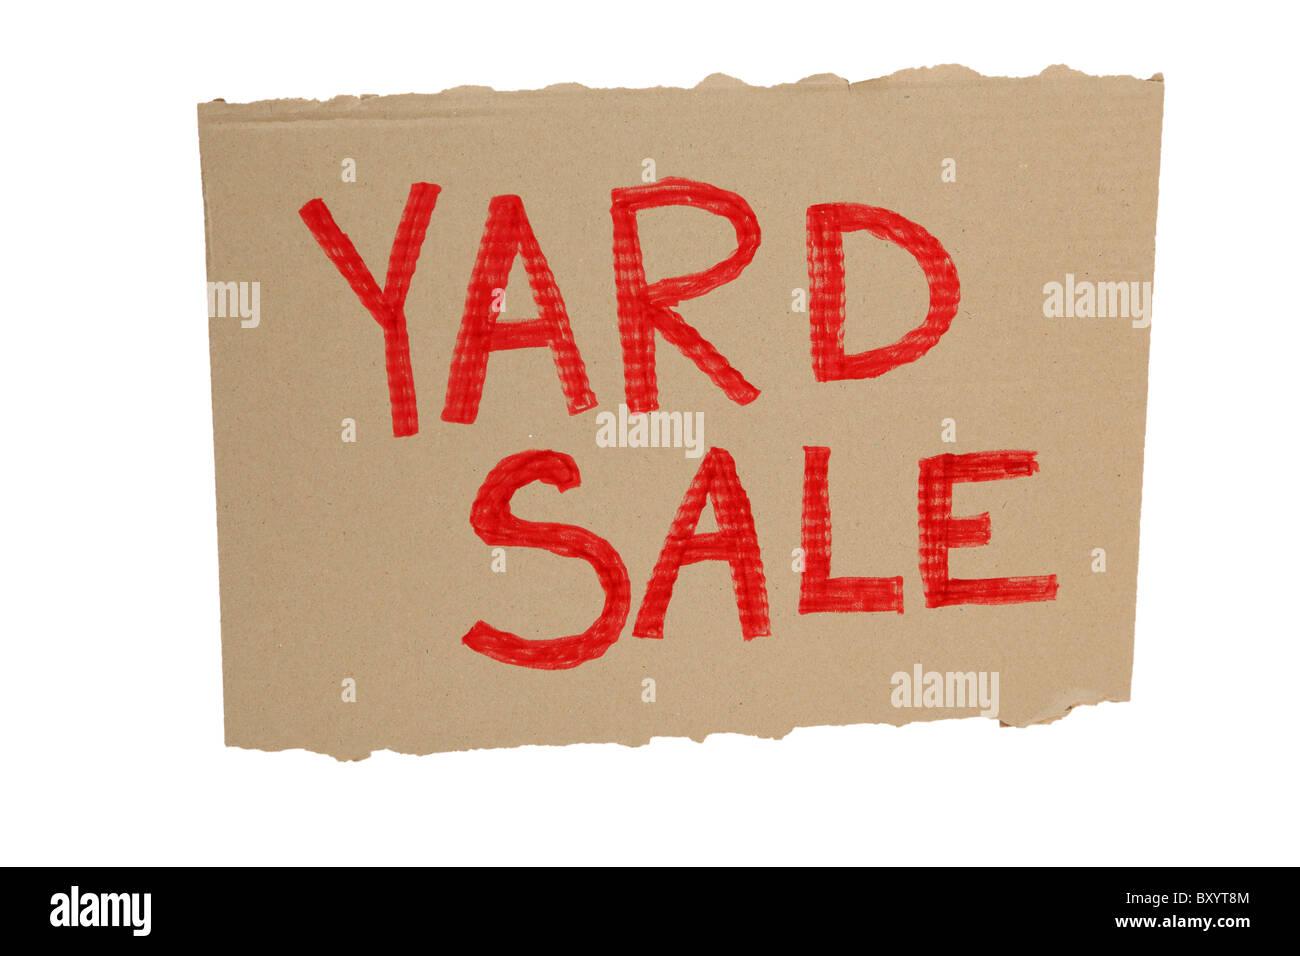 Cardboard yard sale sign on white background - Stock Image